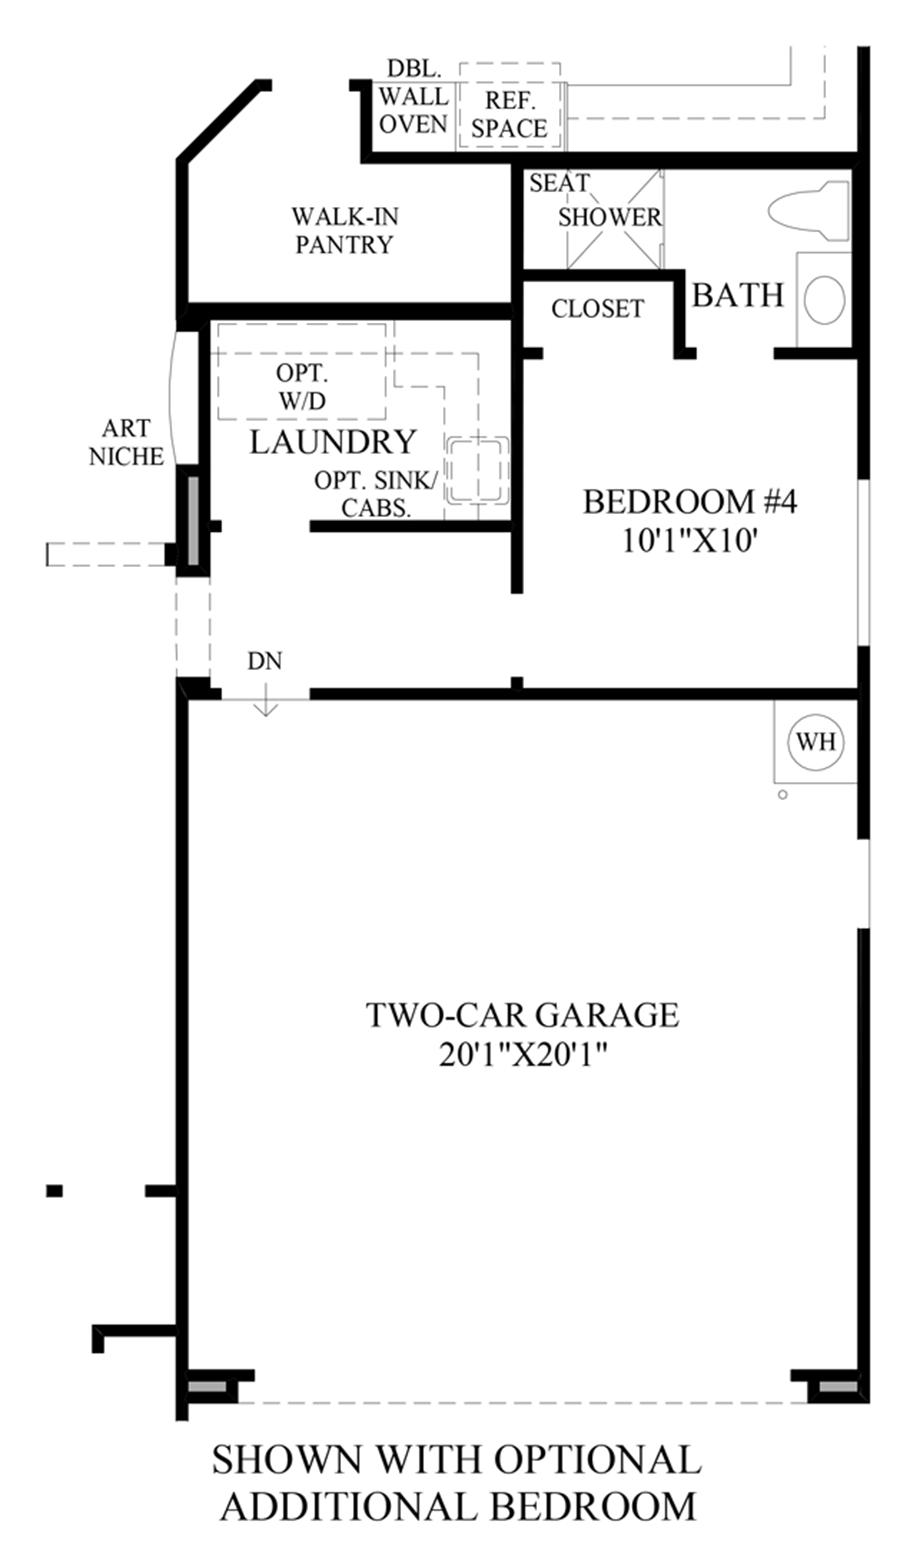 Optional Additional Bedroom Floor Plan